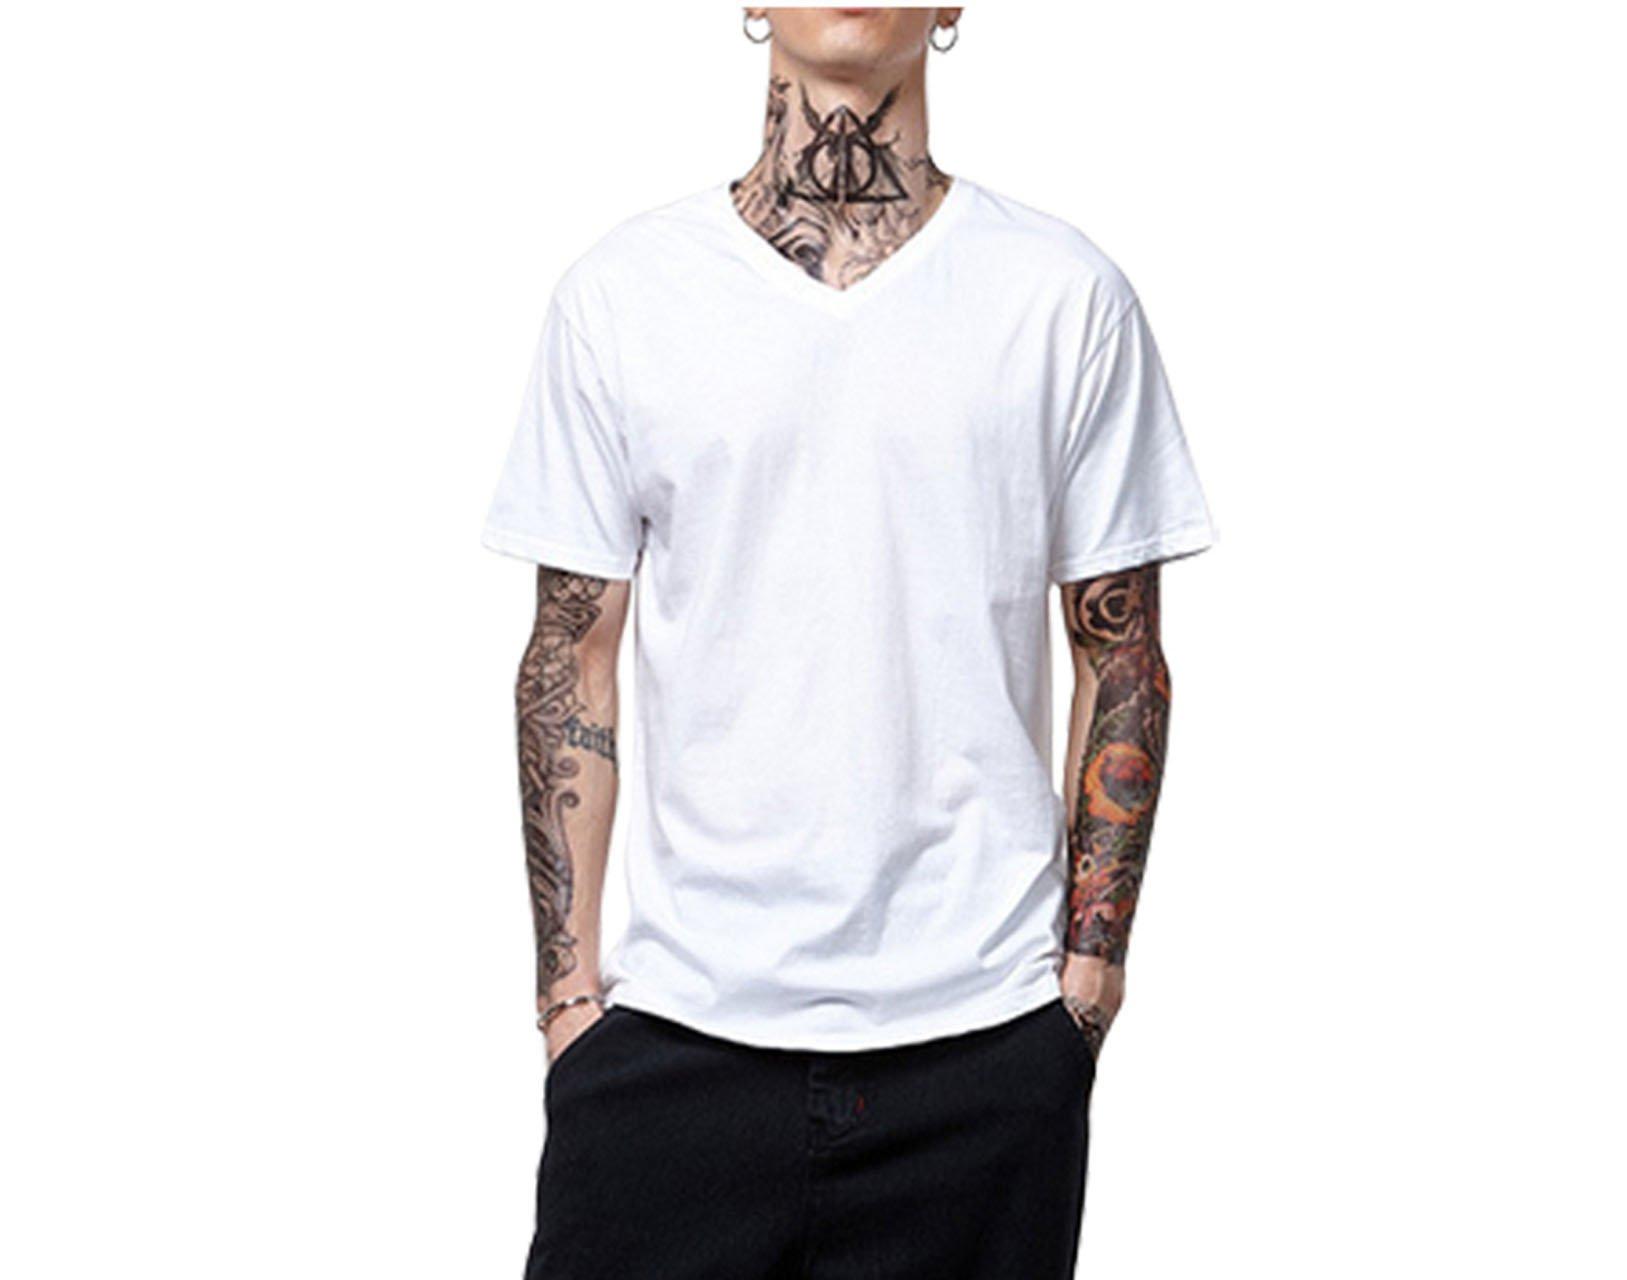 Faleto Basic Herren T-Shirt mit V-Ausschnitt Kurzarm T-Shirt Tops V-Neck, weiß/nachtblau/grau, Gr. L/XL (X-Large, Weiß)